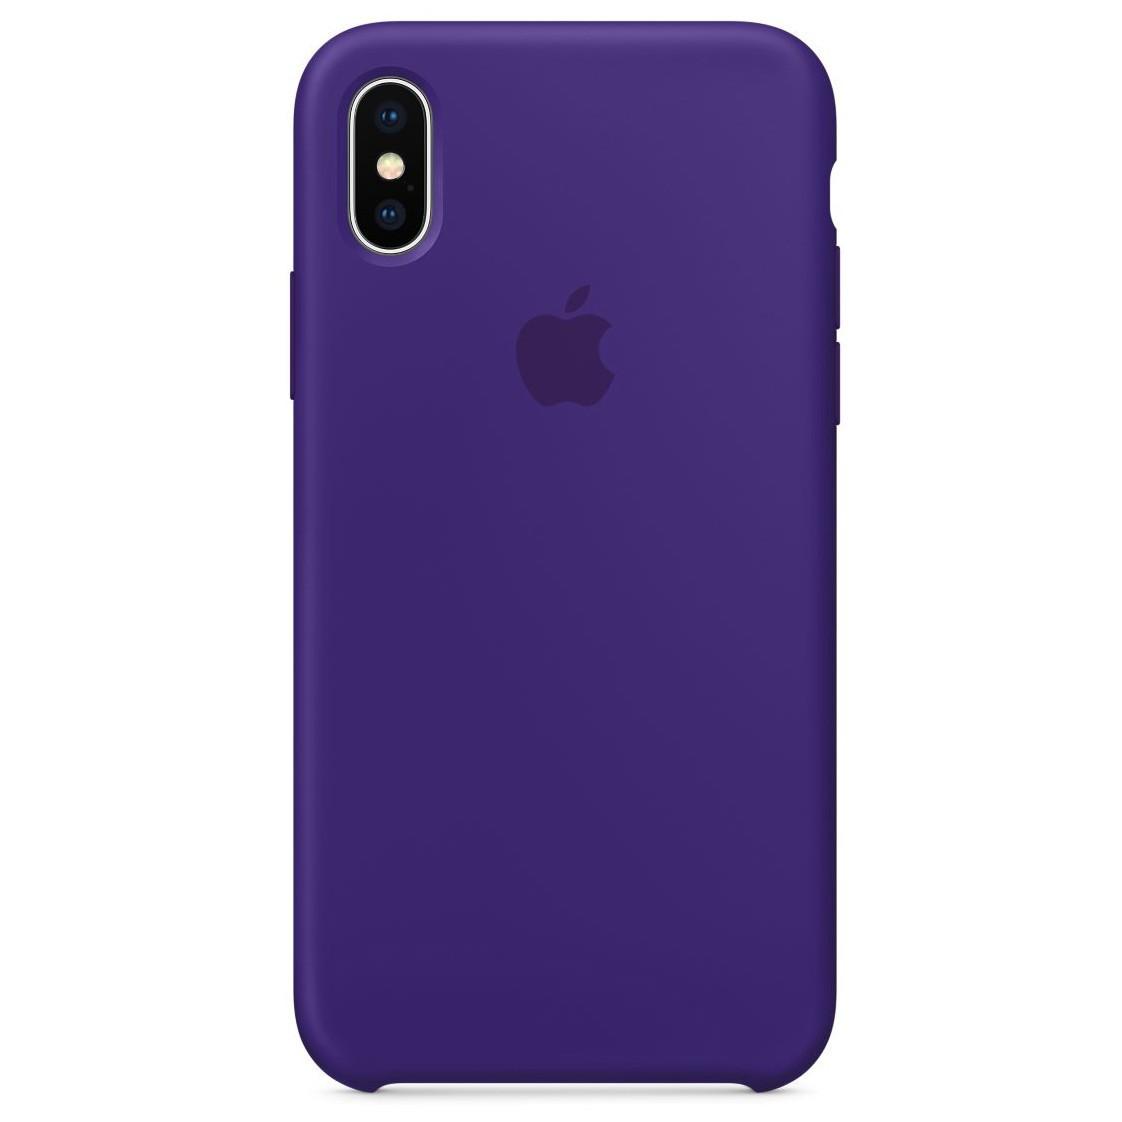 Чехол накладка xCase для iPhone XS Max Silicone Case фиолетовый